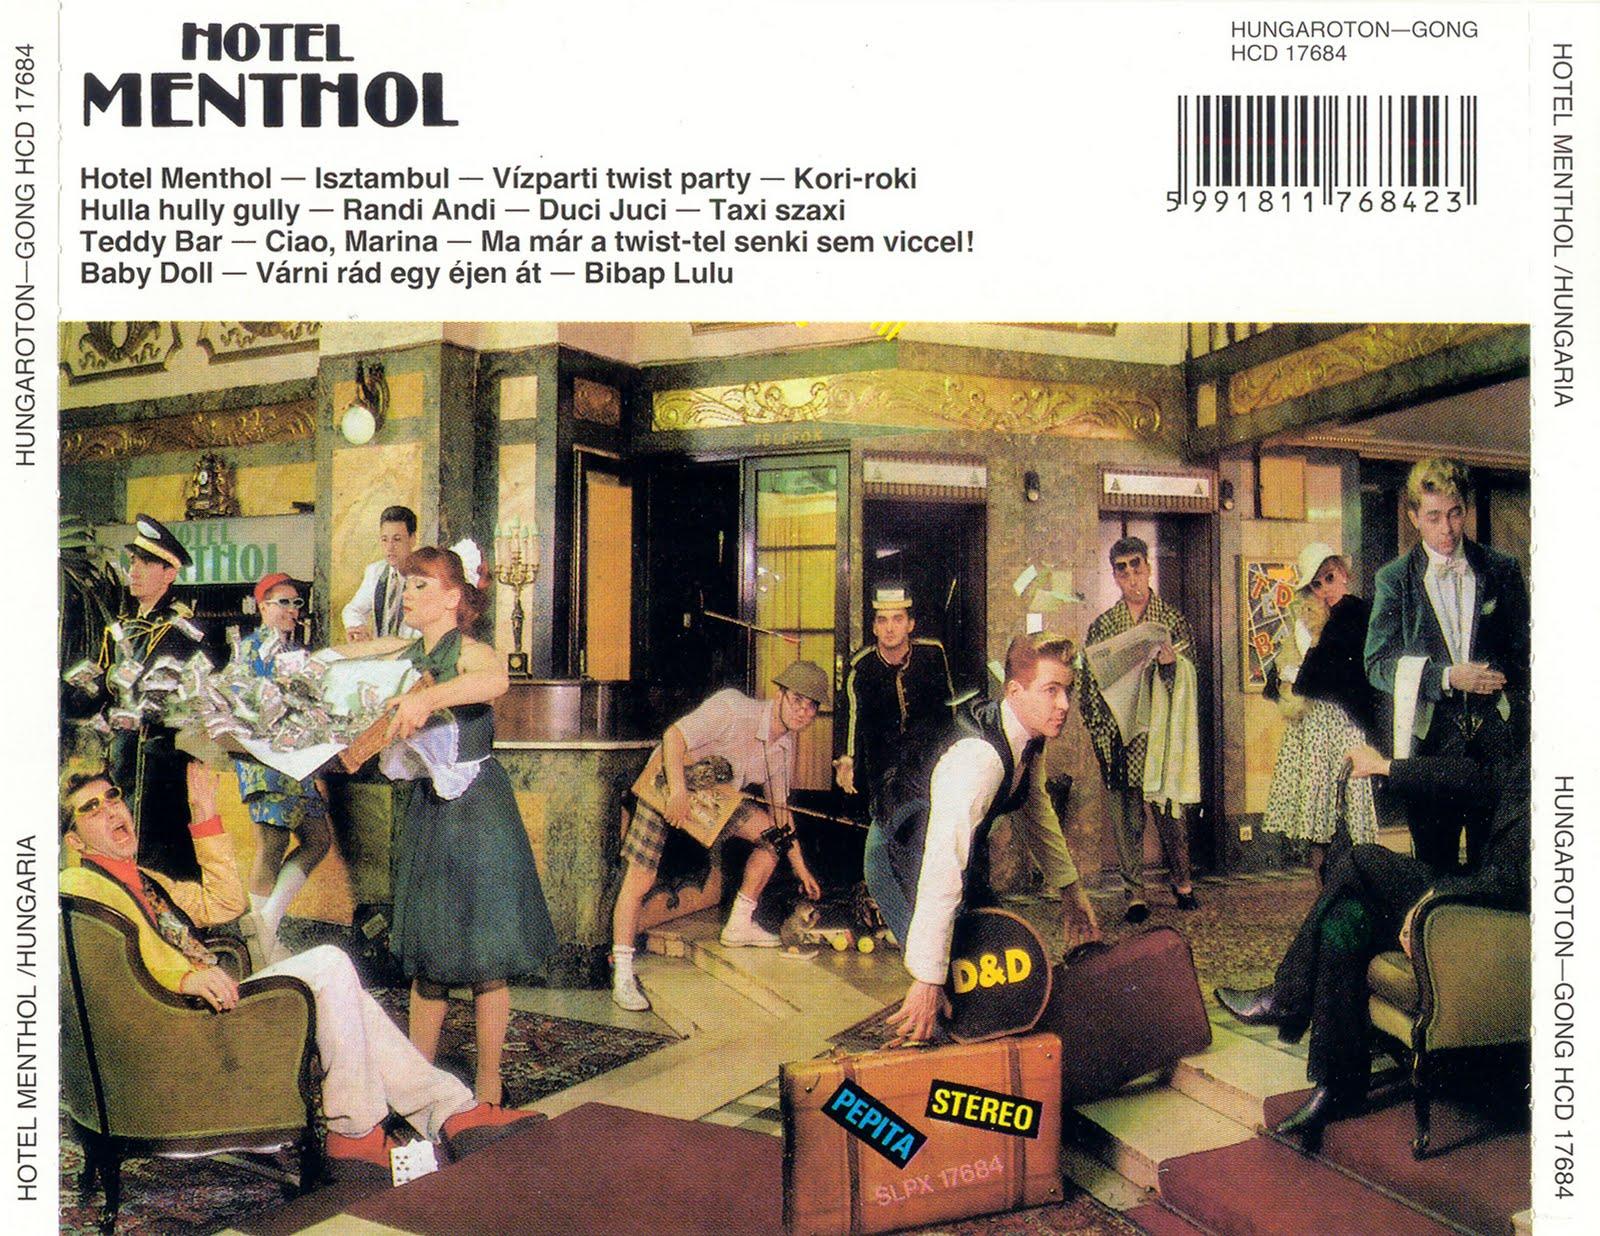 http://1.bp.blogspot.com/_2zOQrXvNnx0/SwwObSf5uII/AAAAAAAACvU/5eXCg8om5wg/s1600/00-Hungaria_-_Hotel_Menthol-(Back)-HU-1992.jpg